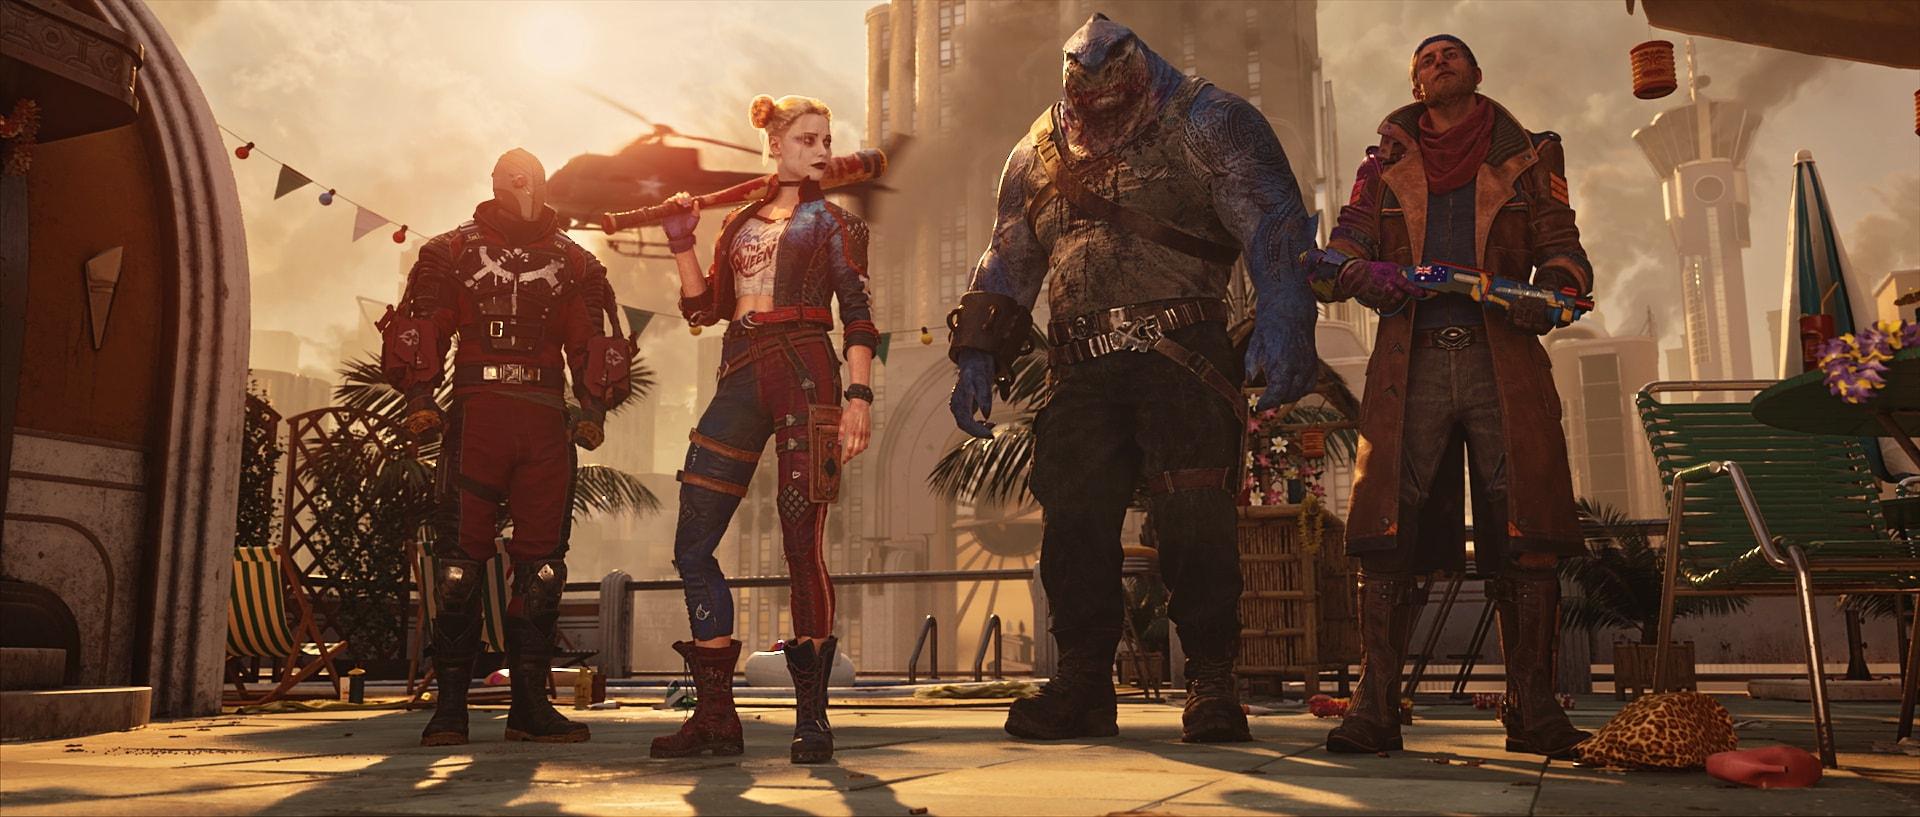 Suicide Squad Kill the Justice League_Reveal Trailer_Image1_Squad-495115f421b1c69bec0.56549031